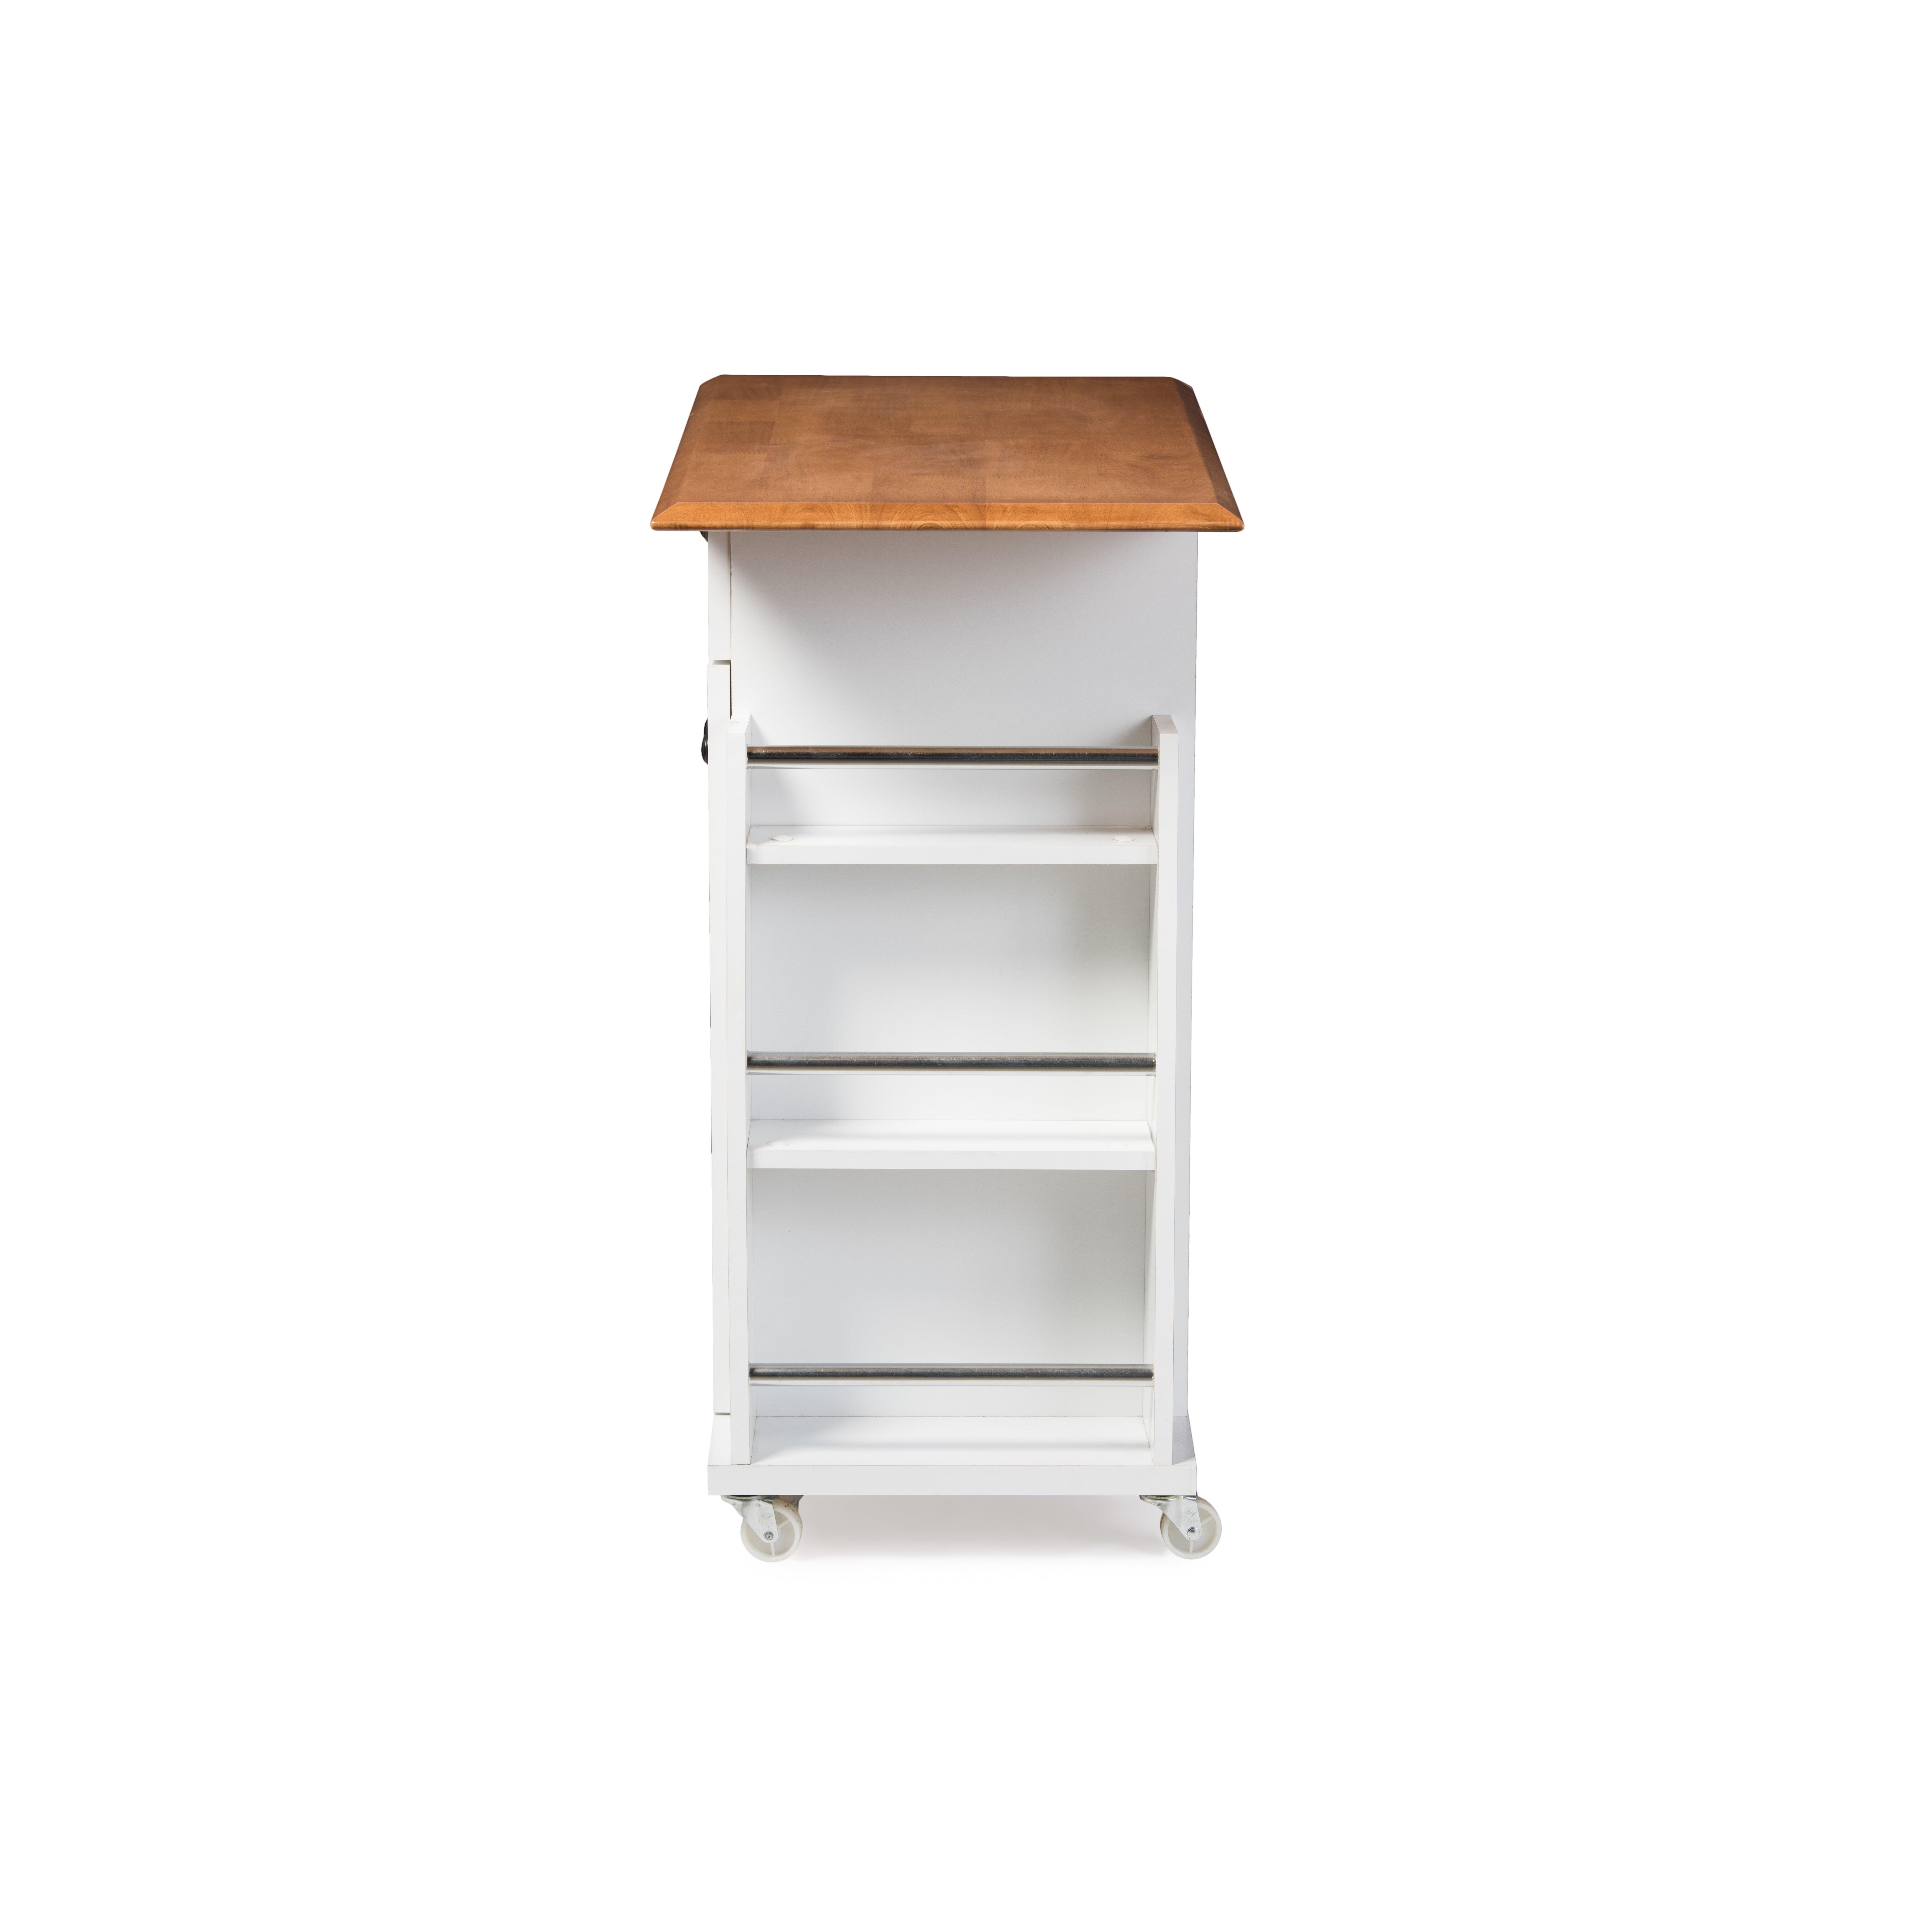 Wholesale Interiors Bradford Serving Cart Reviews: Wholesale Interiors Baxton Studio Kitchen Cart & Reviews